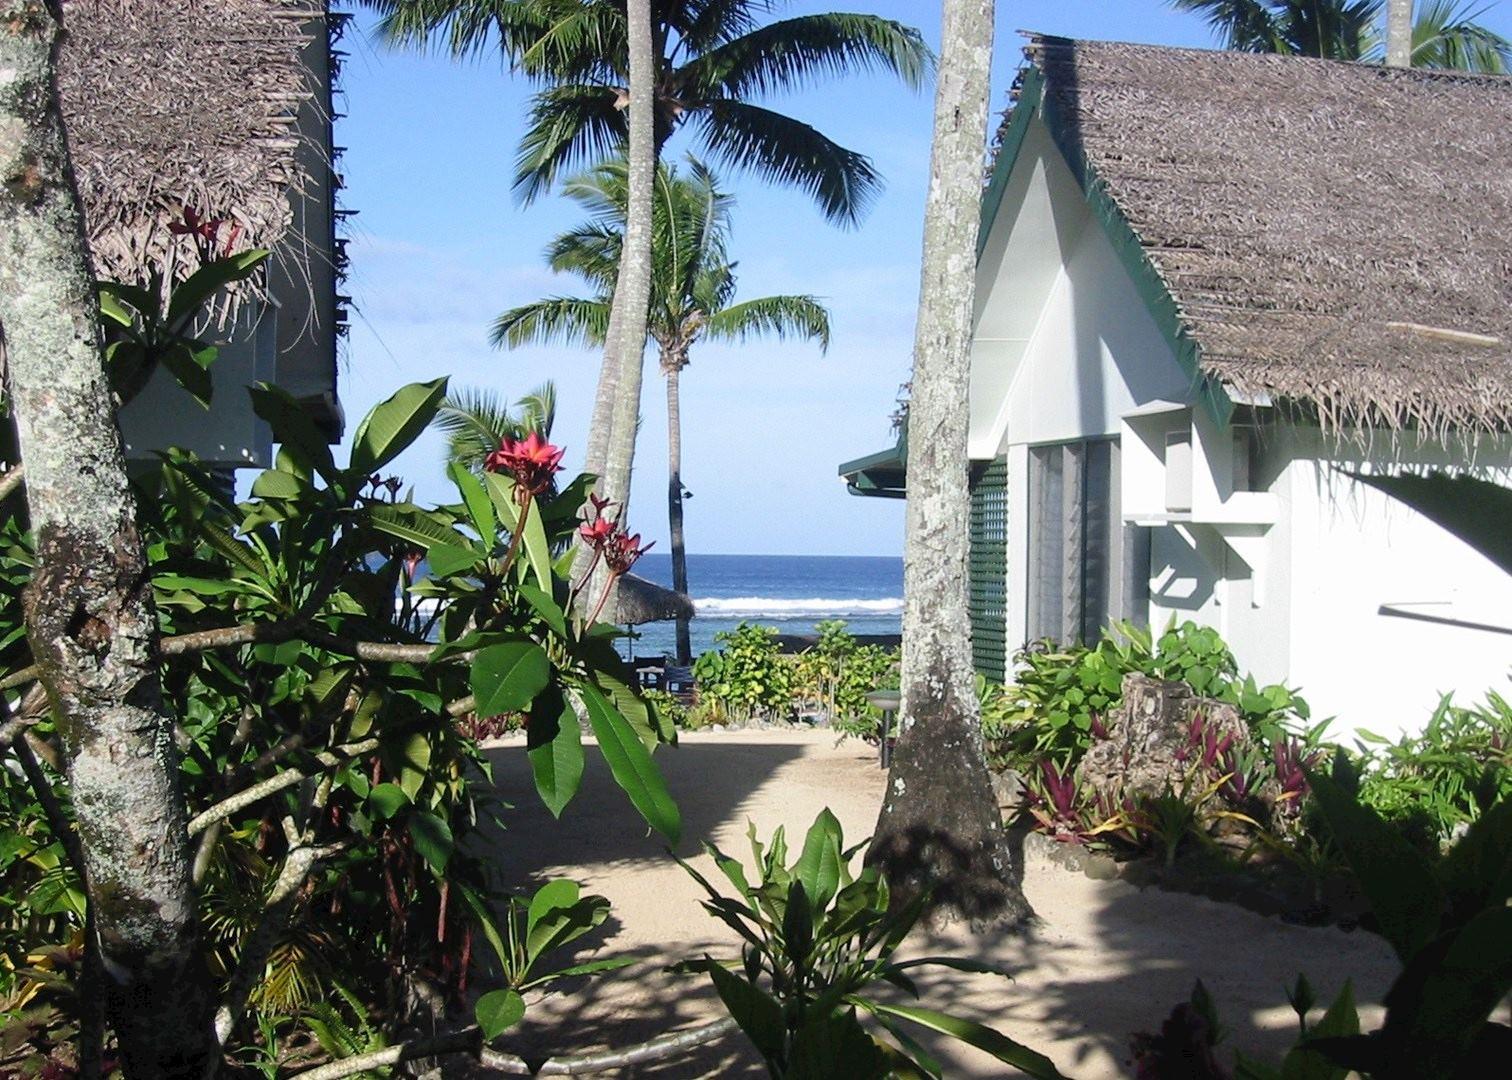 Manuia Beach Boutique Hotel